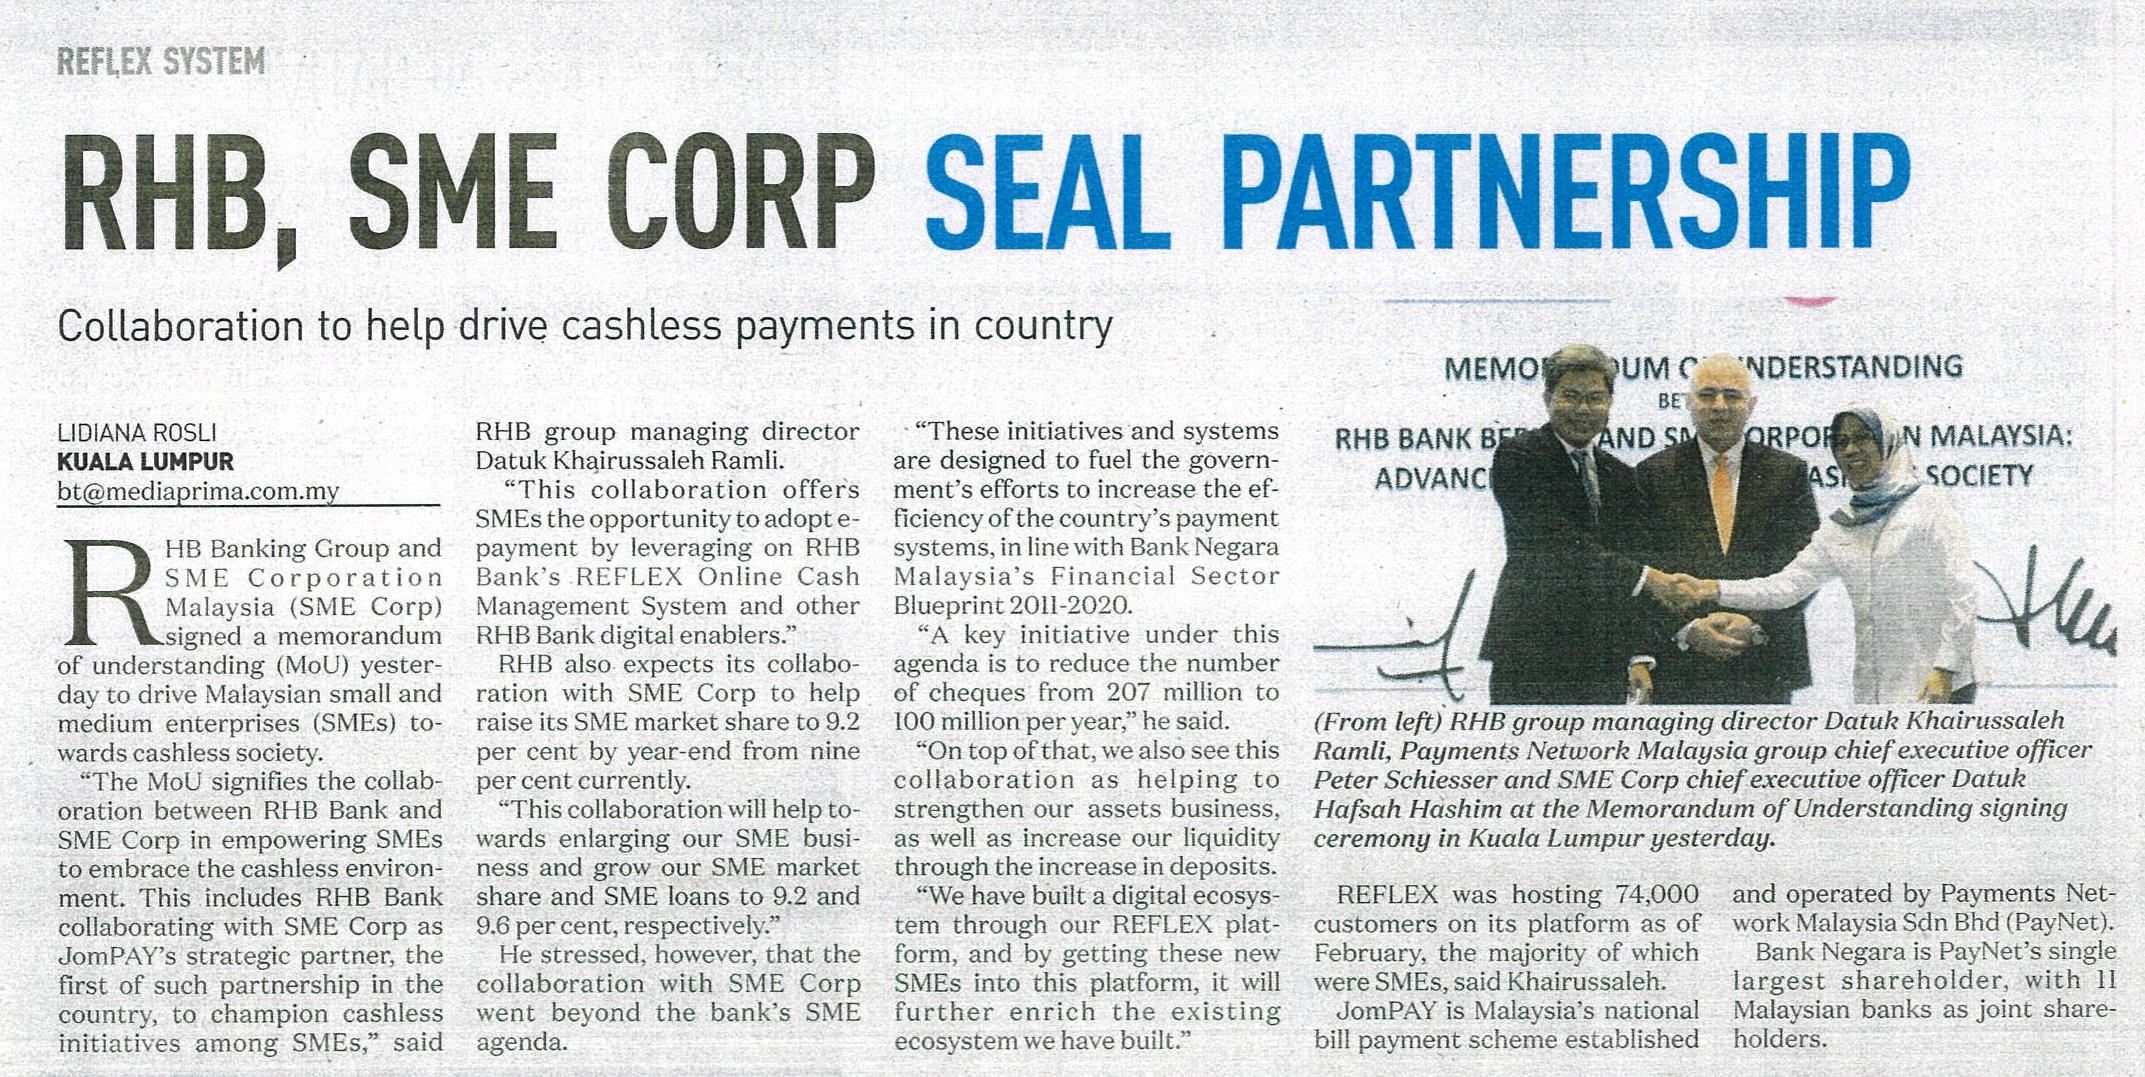 SME Corporation Malaysia - RHB, SME Corp  seal partnership